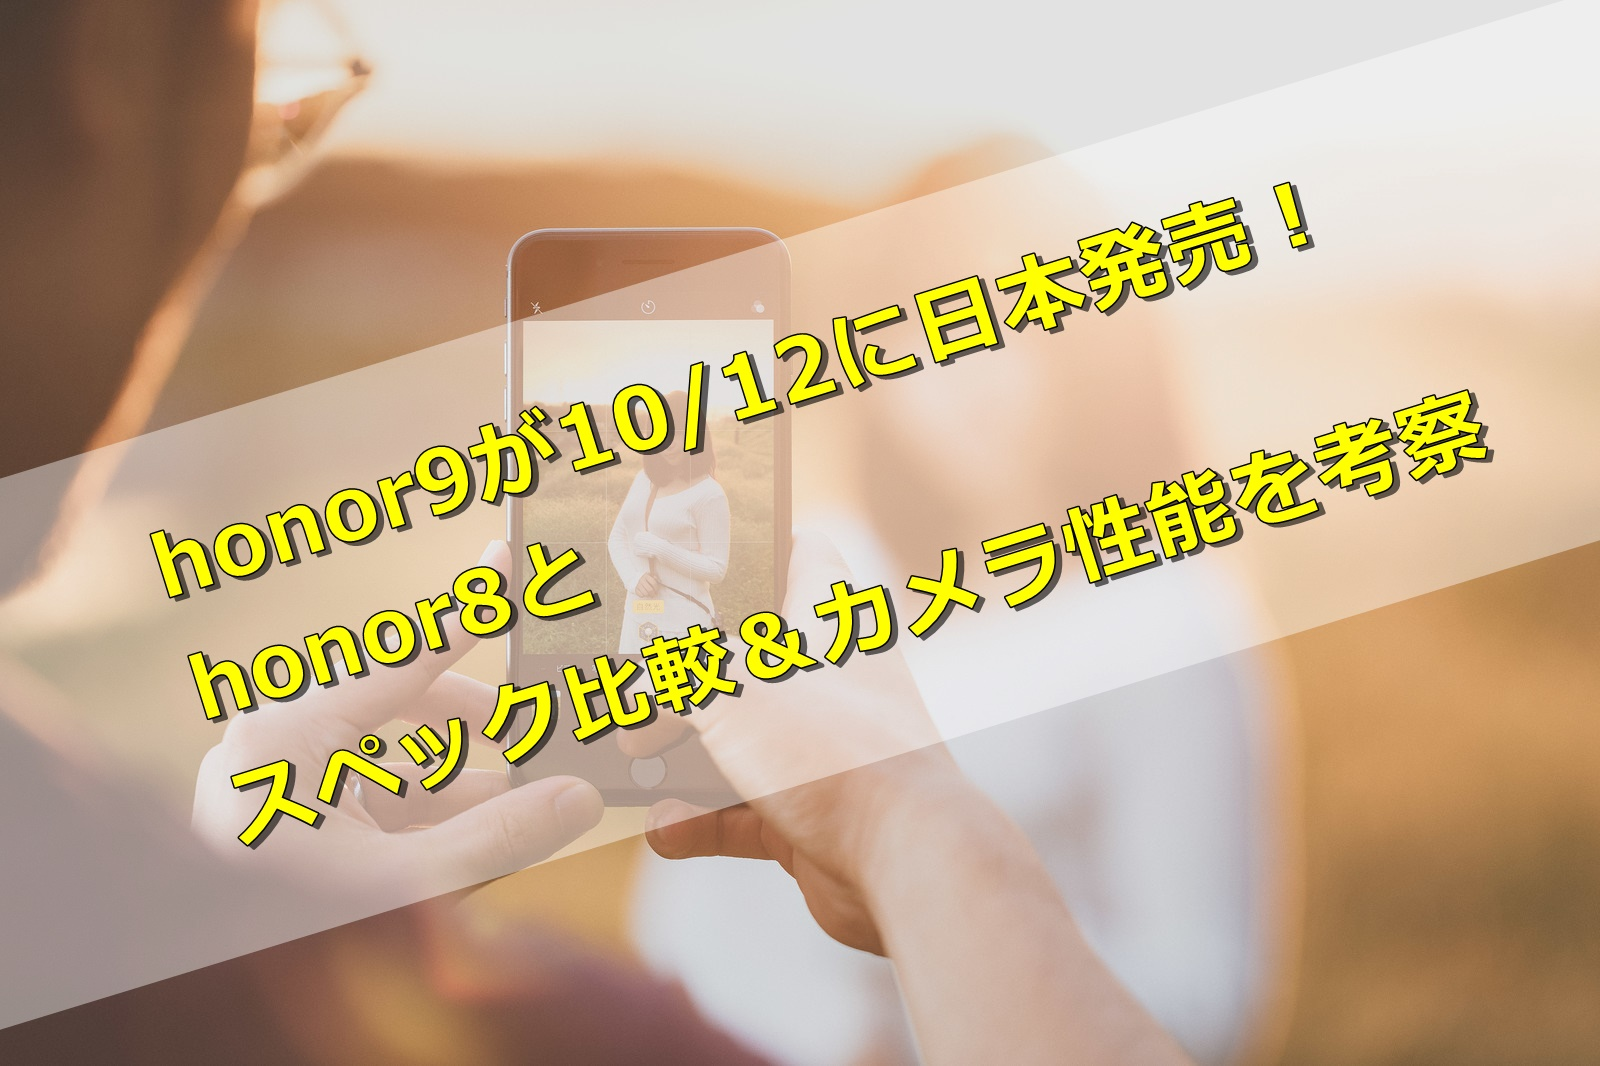 honor9が10/12に日本発売!honor8とスペック比較&カメラ性能を考察